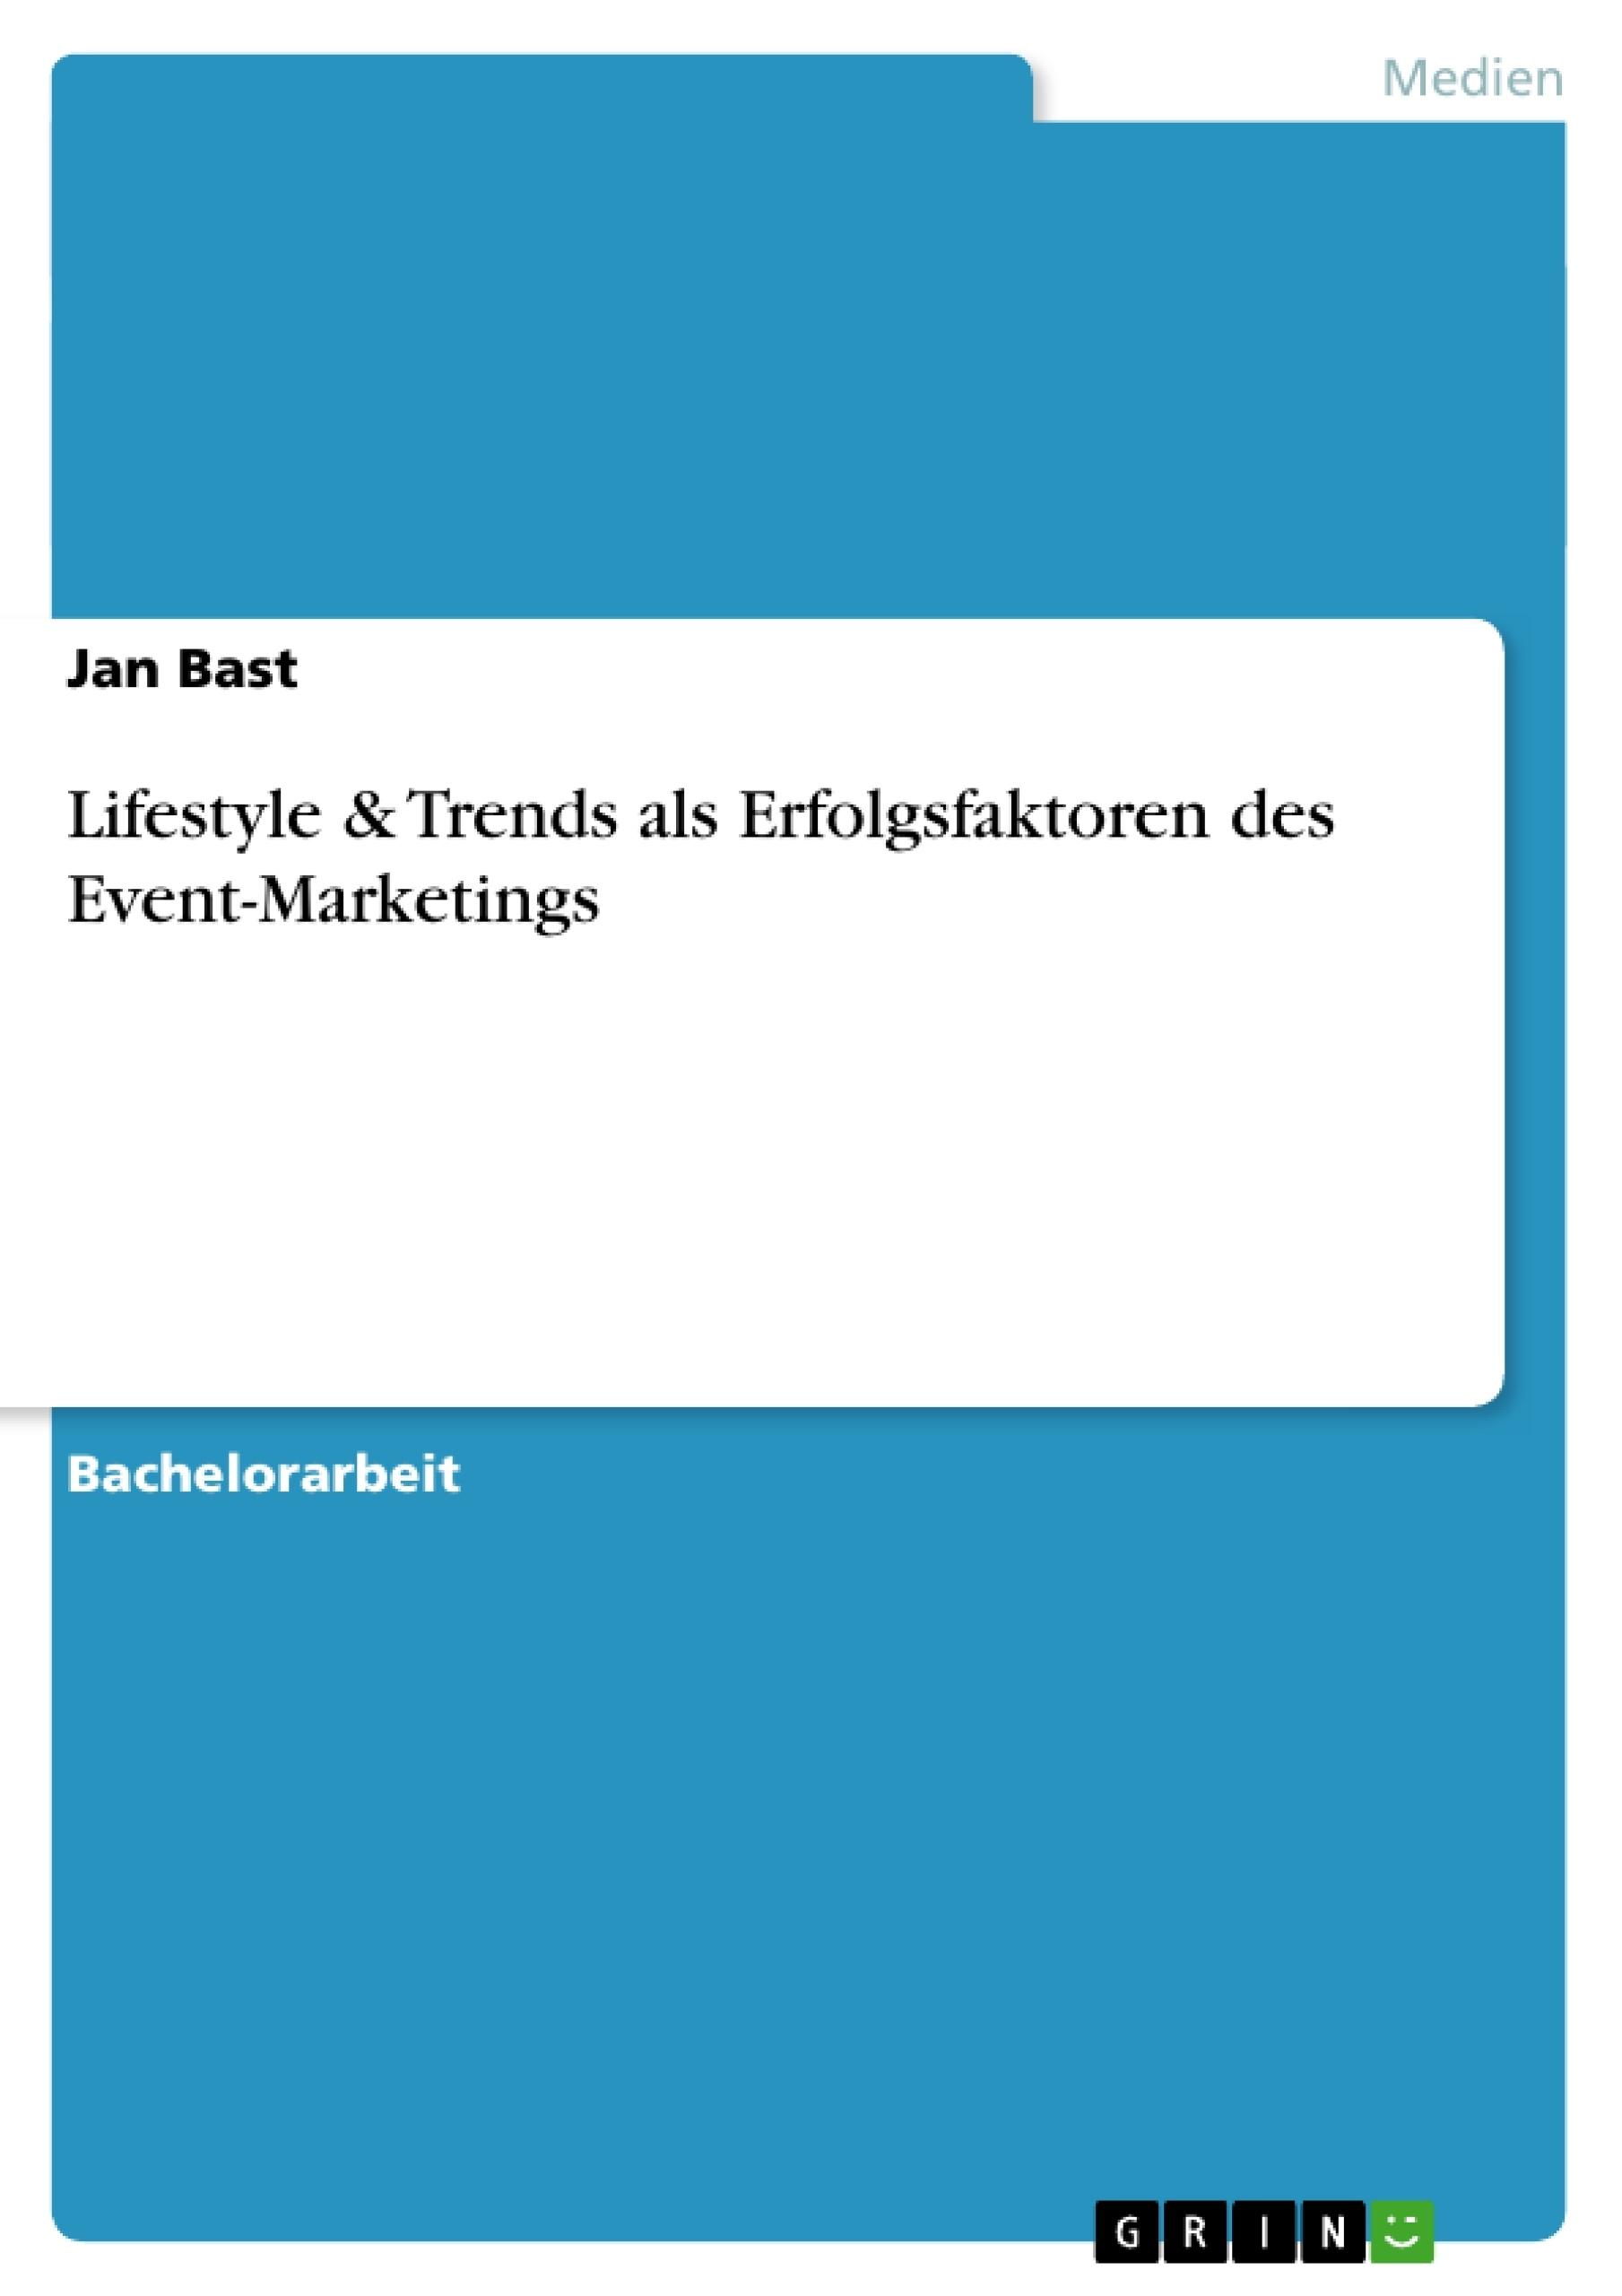 Titel: Lifestyle & Trends als Erfolgsfaktoren des Event-Marketings